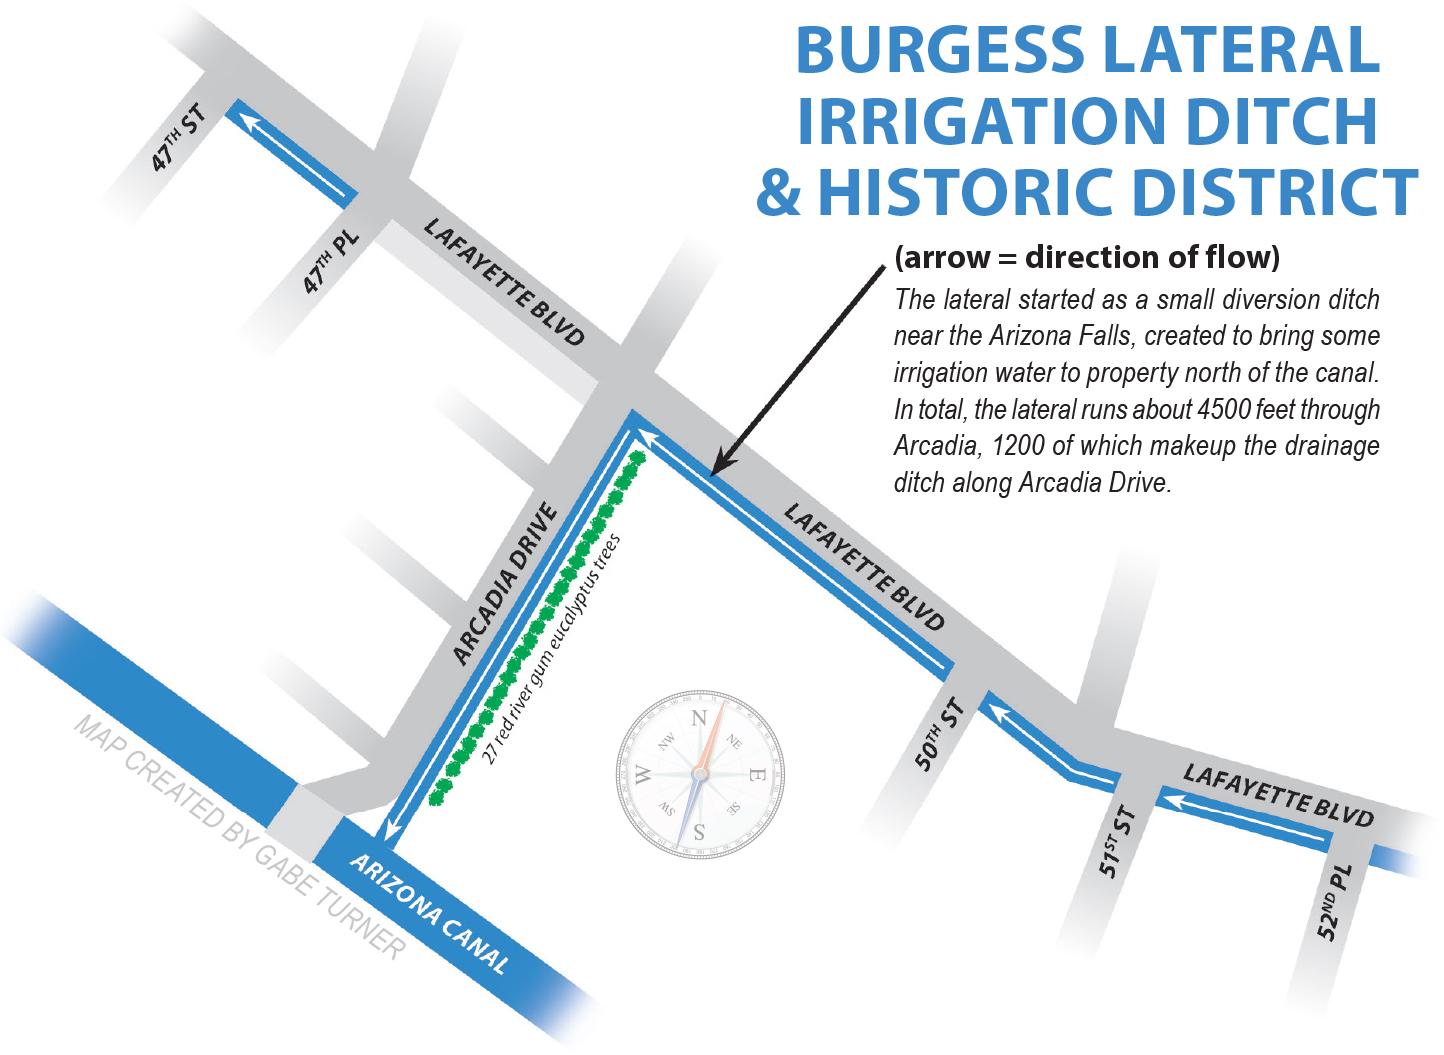 Burgess Lateral.jpg